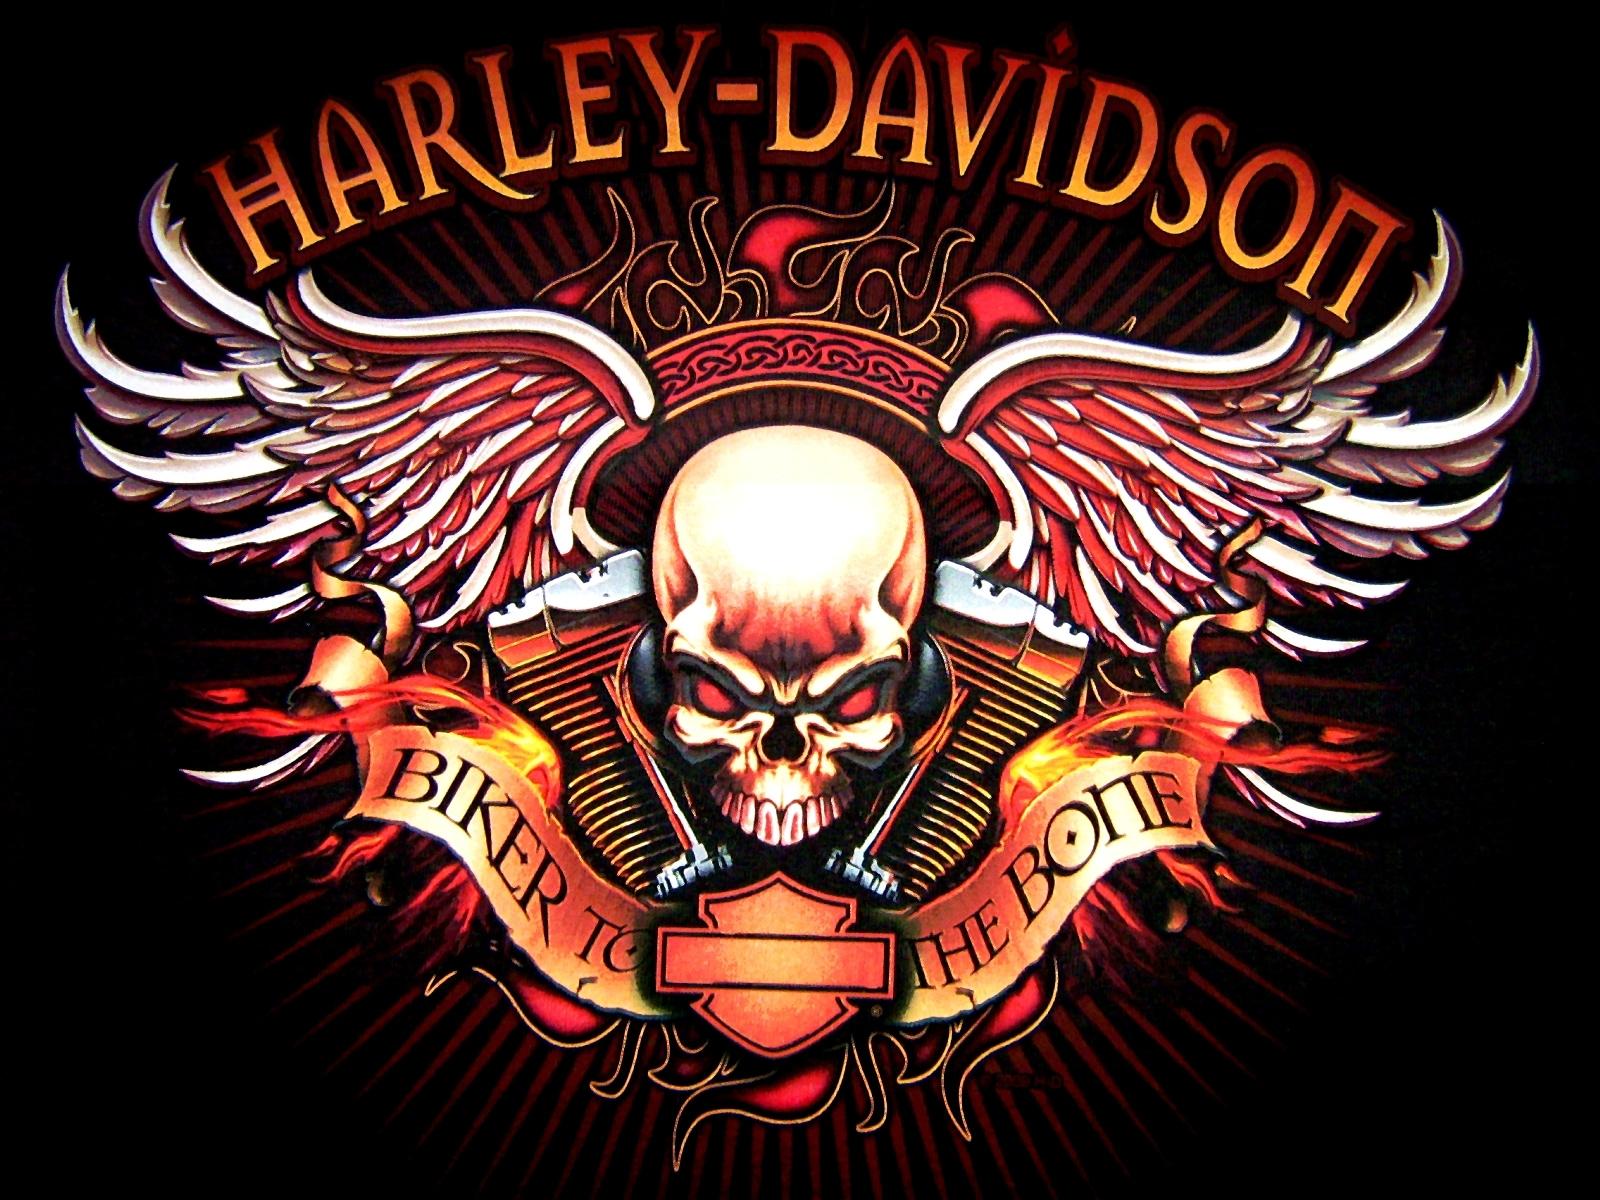 Harley Davidson logo skull bikes motorcycle wallpaper 1600x1200 1600x1200